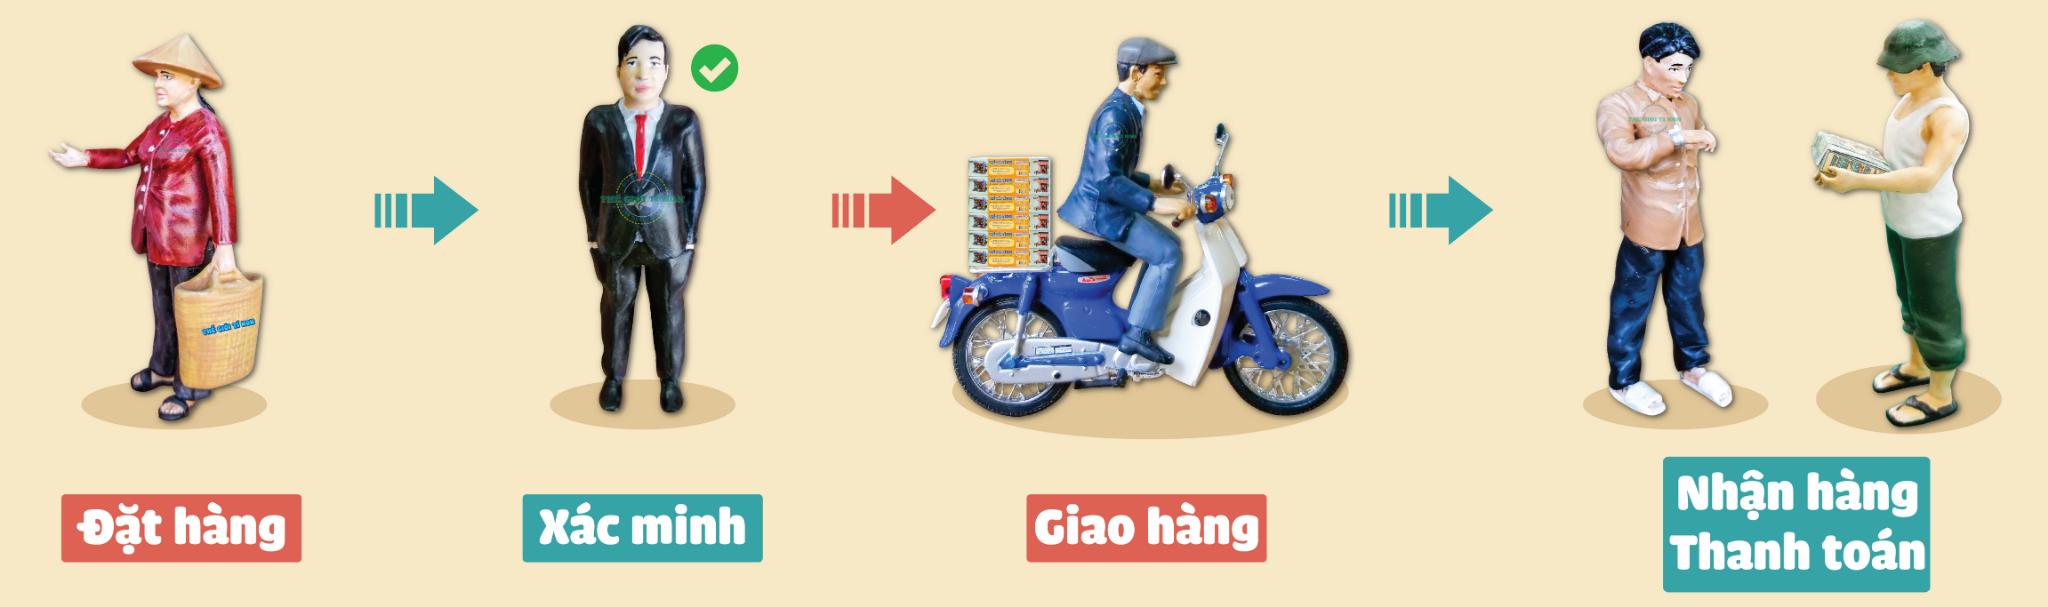 mo_hinh_biet_thu_sang_trong_thu_nho_tu_lap_ghep_bang_go_handmade_k045 (1)